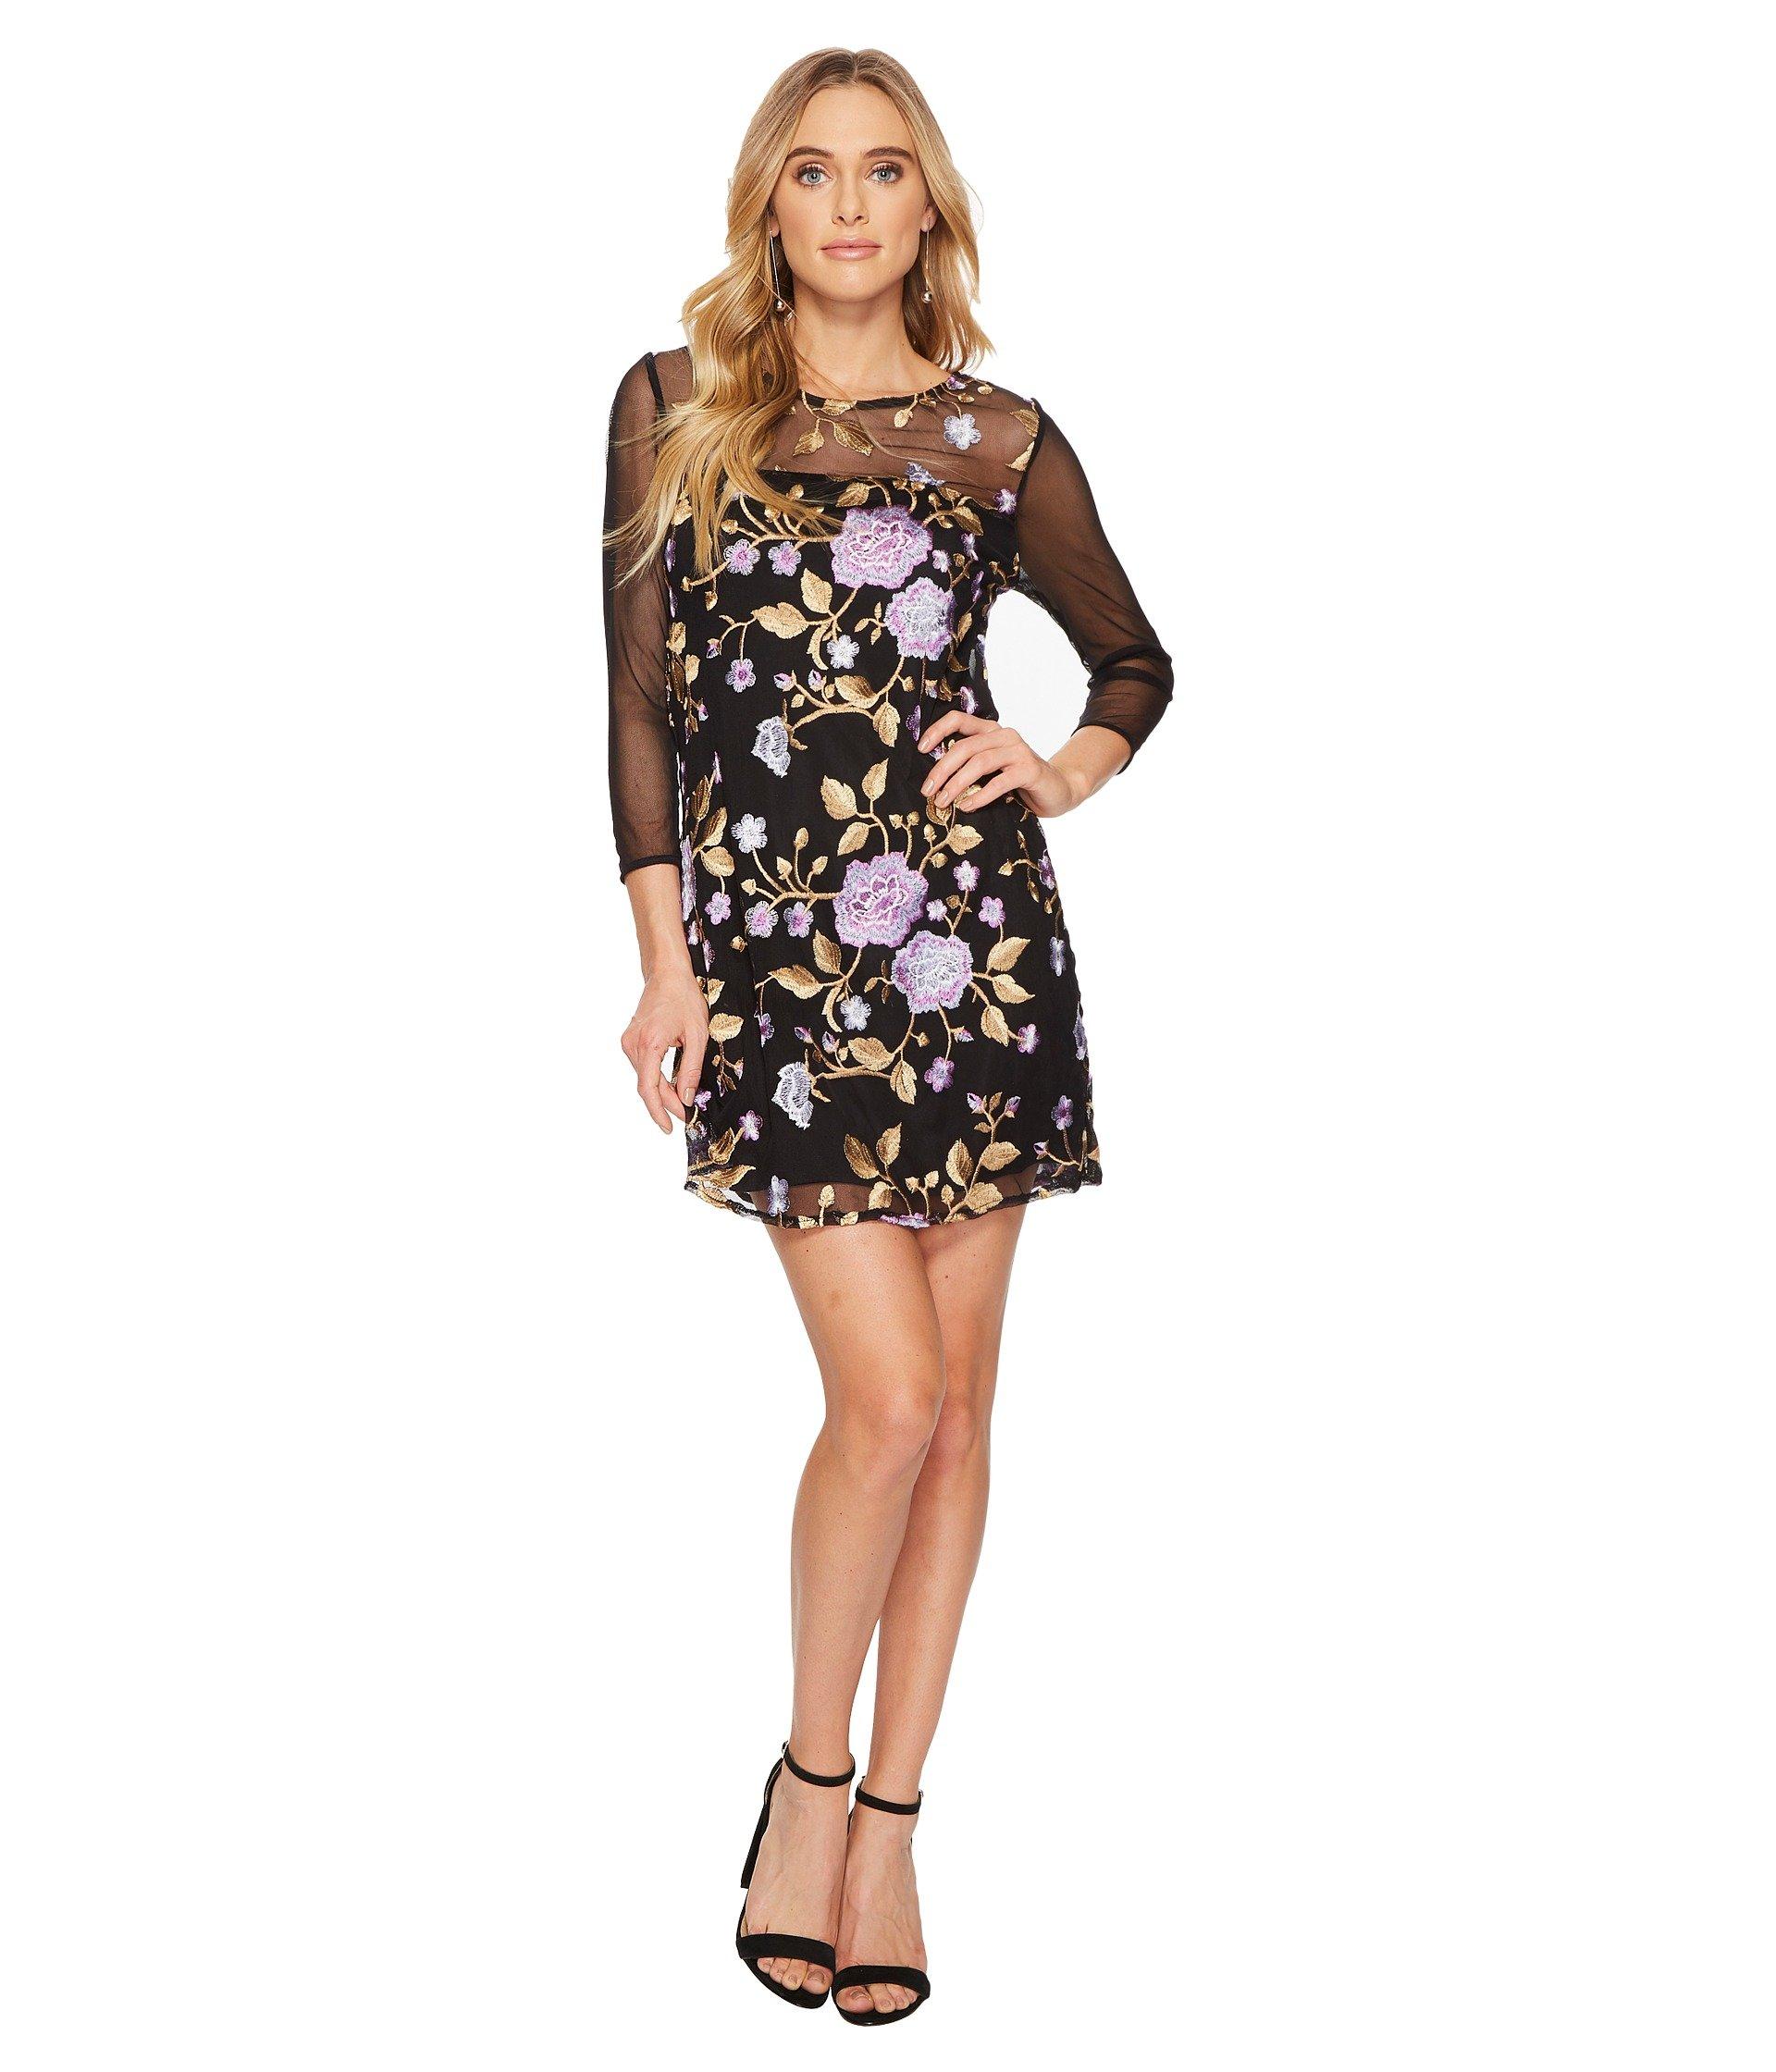 Jaelyn Embroidered Mesh Dress, Black